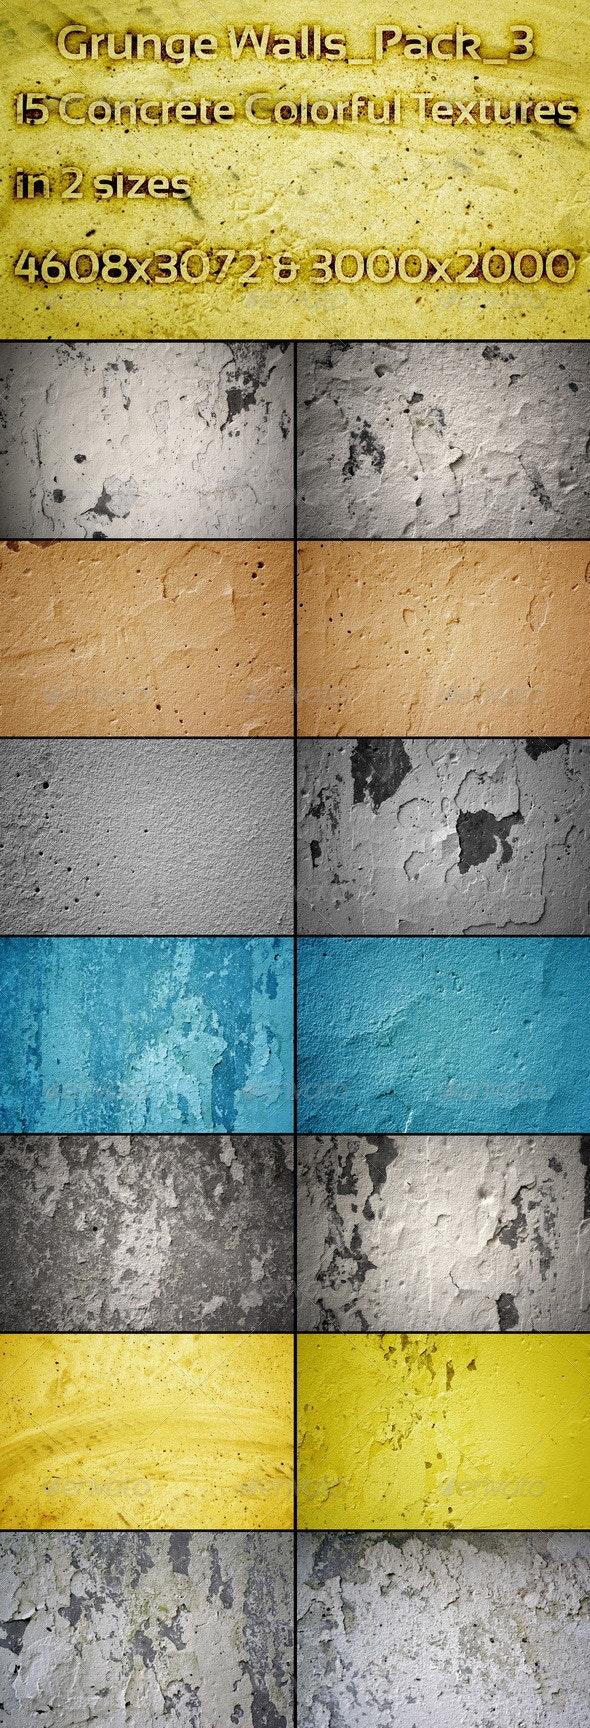 Grunge Walls_Pack_3 - Concrete Textures